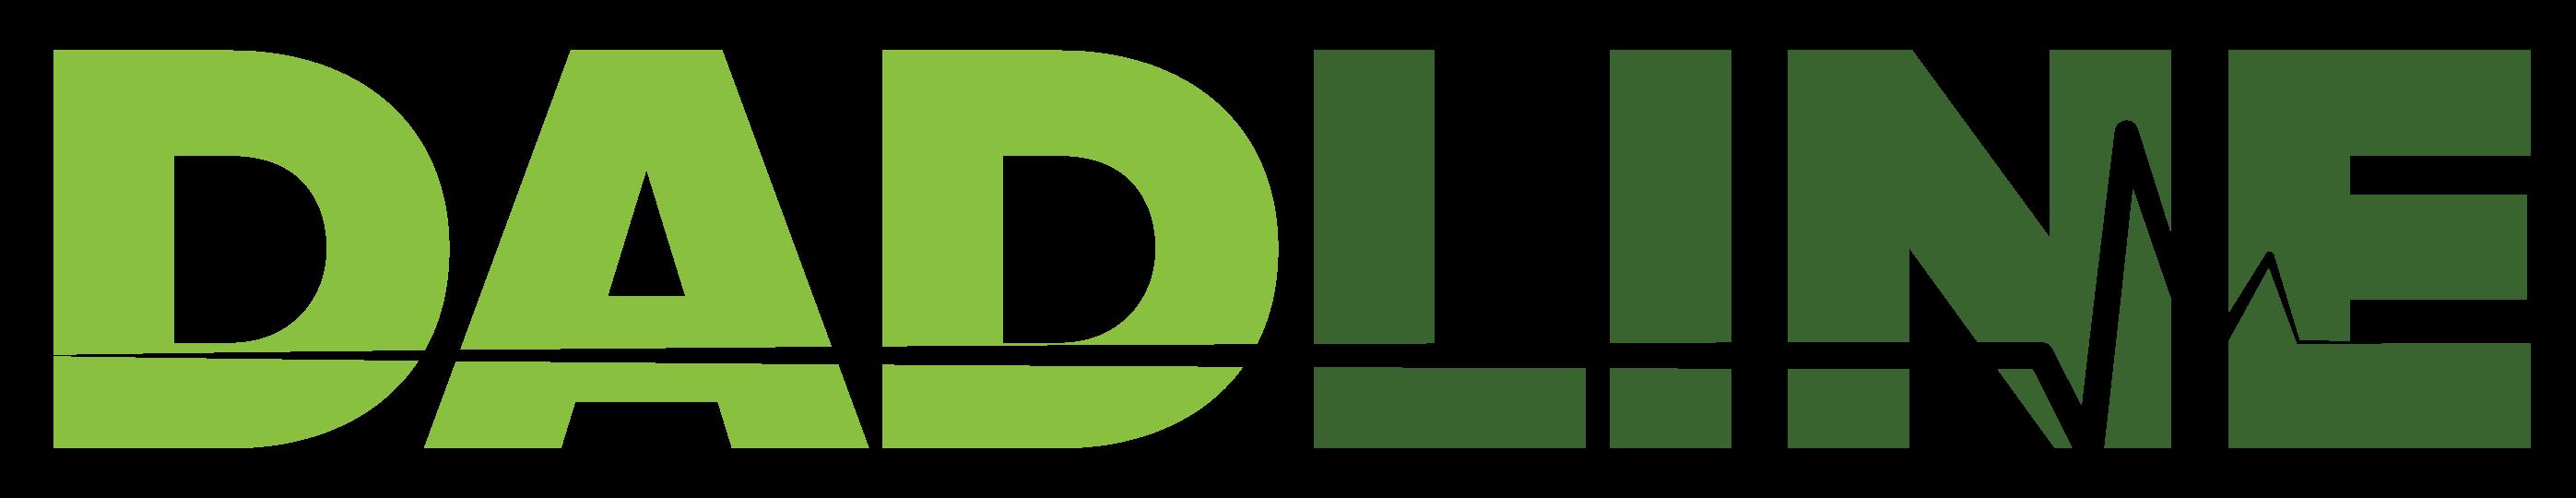 Dadline Program